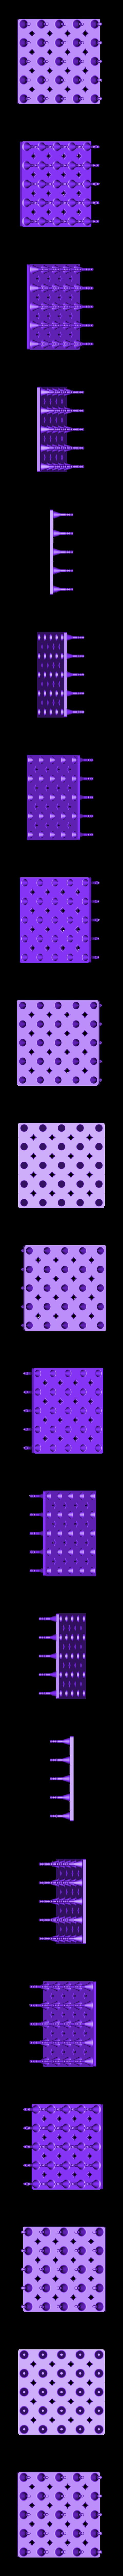 GeoBoard5x5_A.stl Download free STL file Geoboard, Geometric Board, Cartesian, Isometic, Circular, Geometry, Math • 3D printer object, LGBU